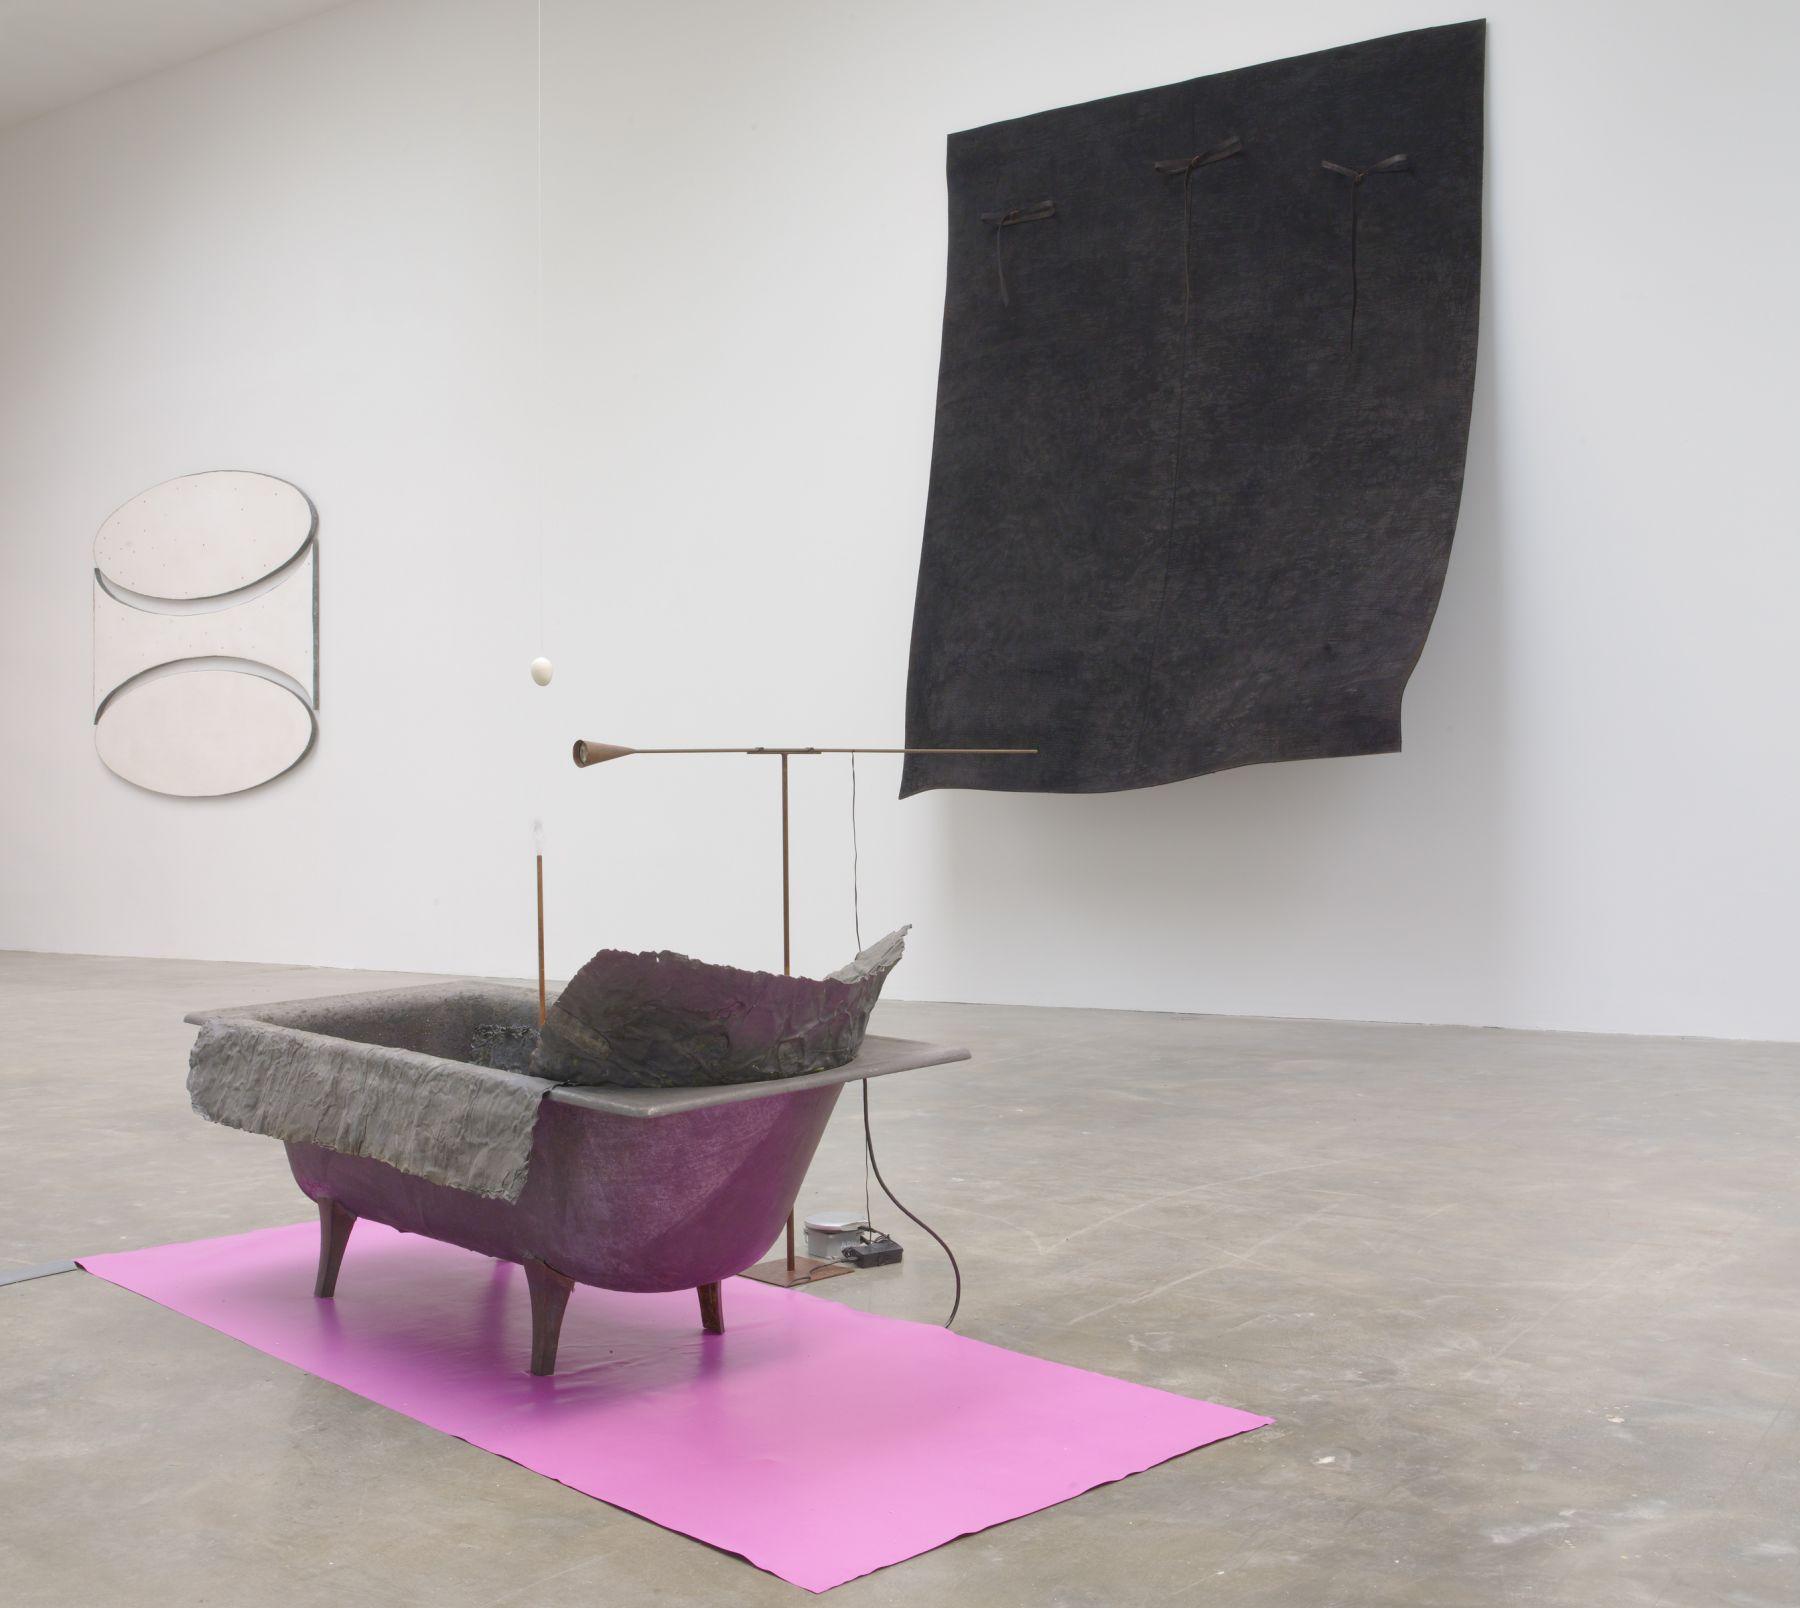 an installation view of a Pier Paolo Calzolari exhibition in a New York City contemporary art gallery